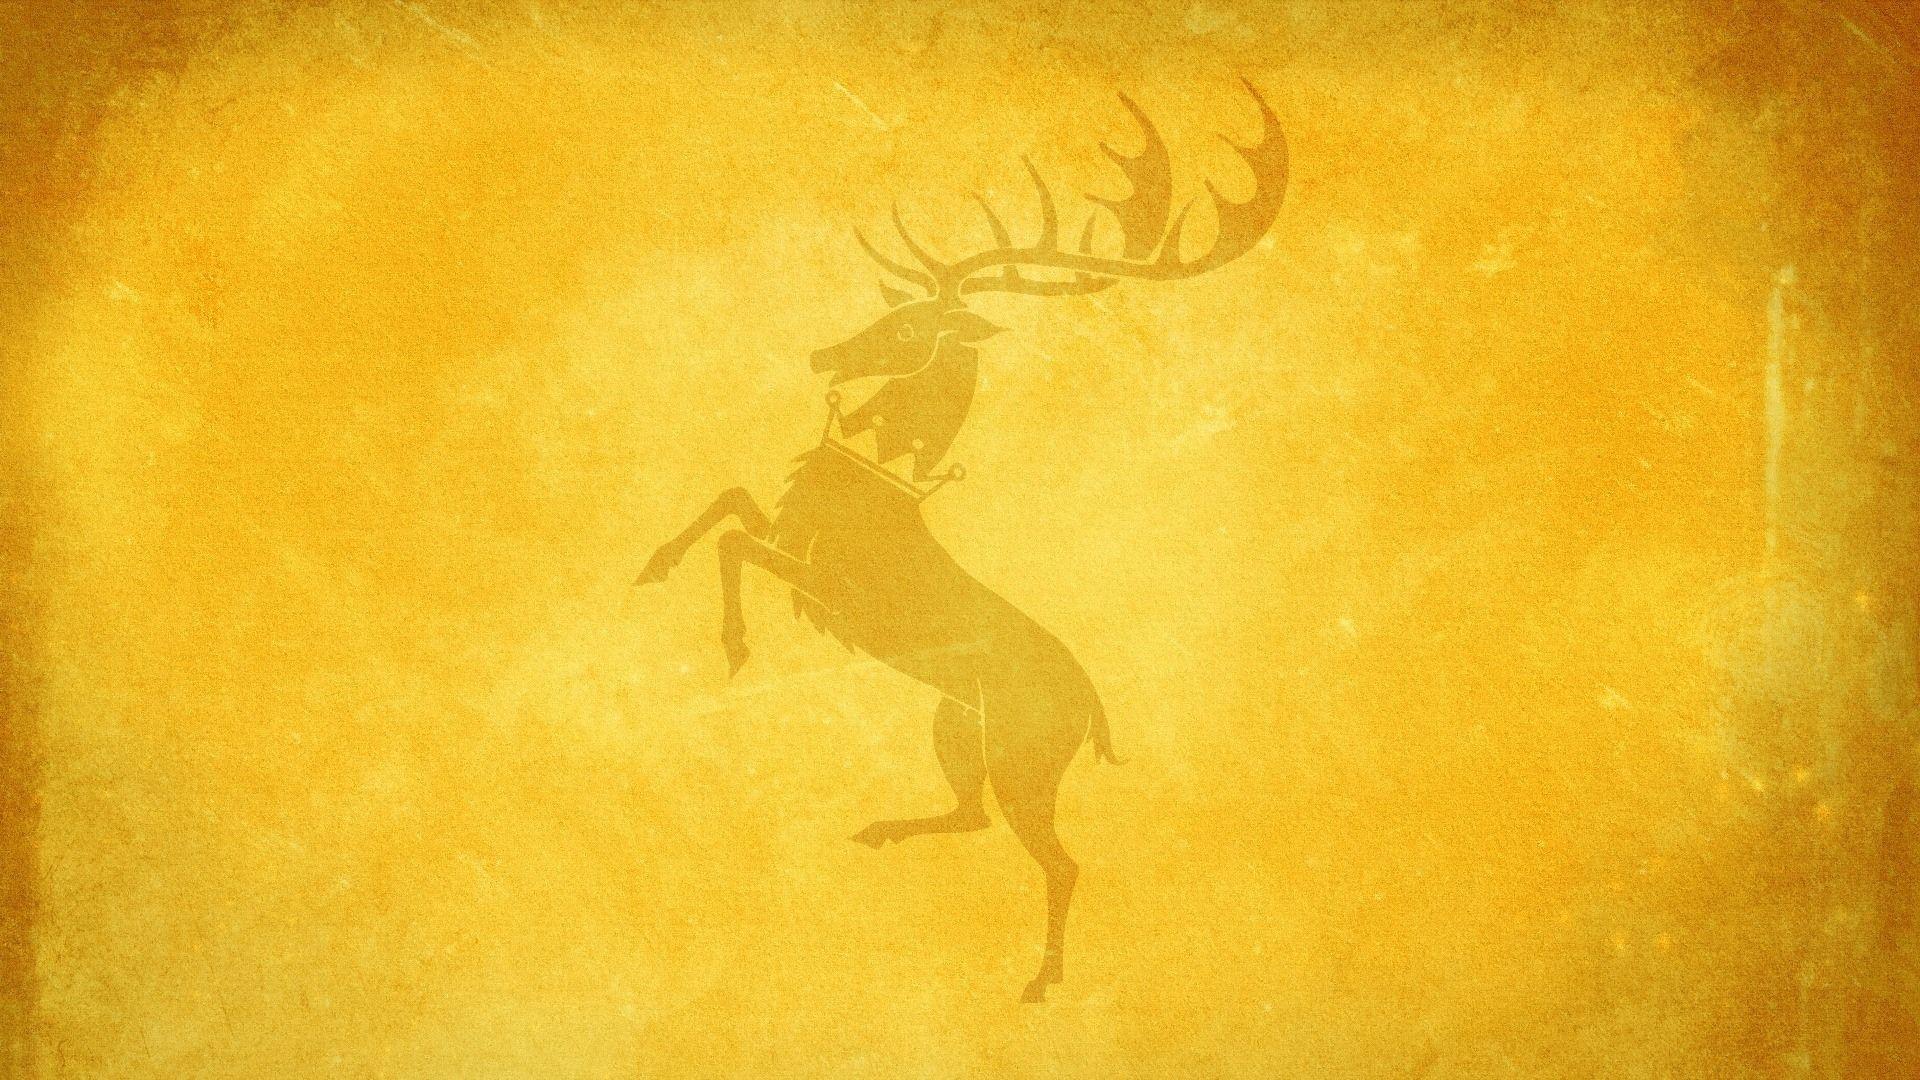 Game of Thrones House Baratheon Minimalist